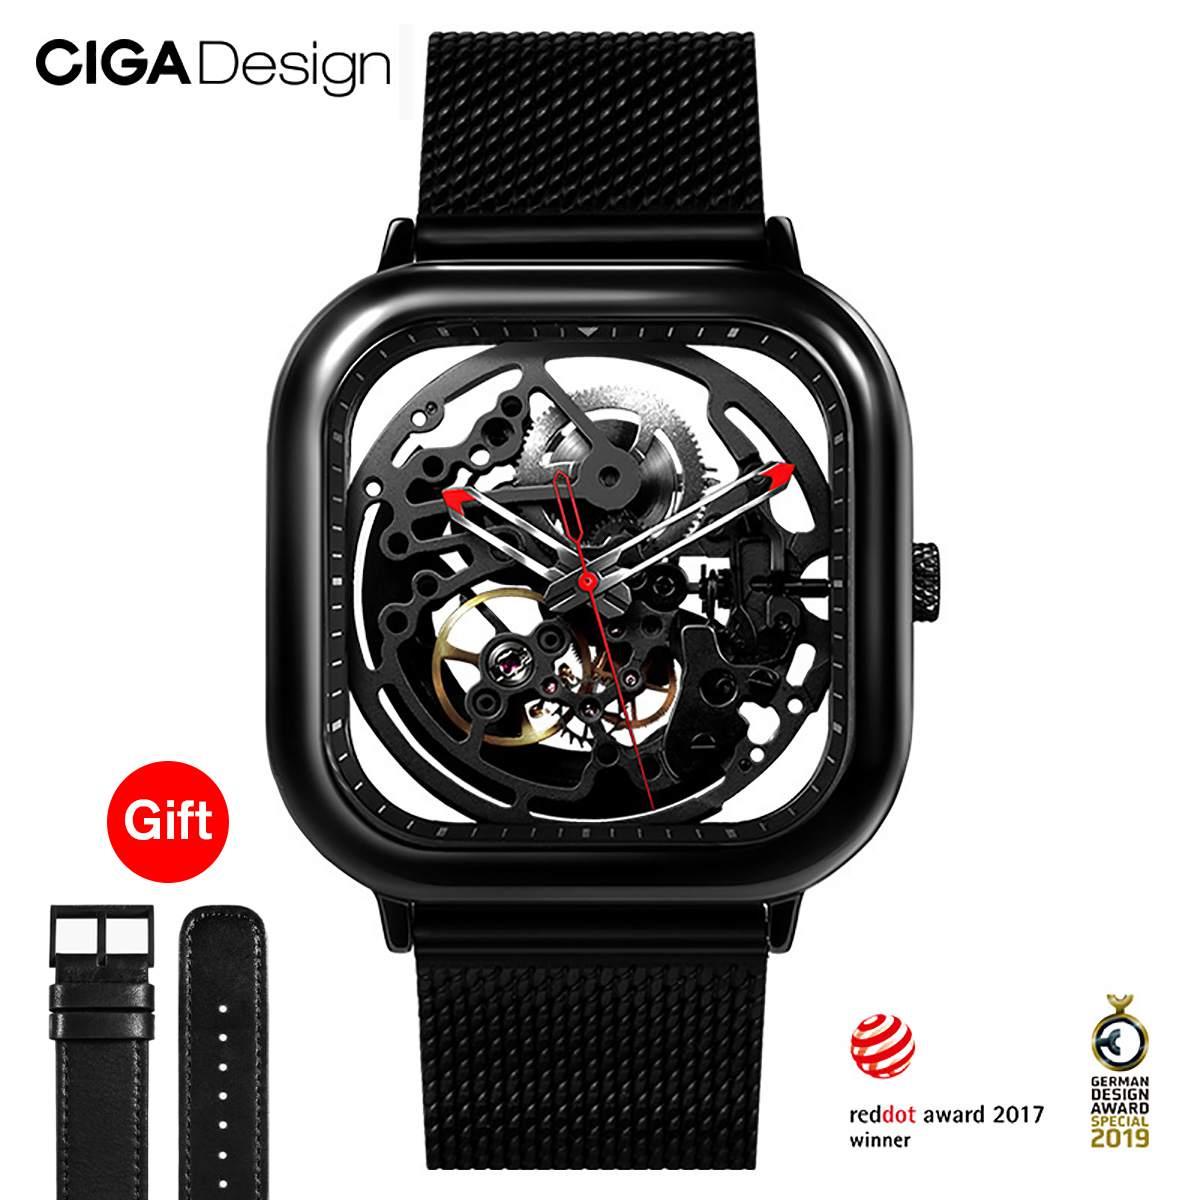 Reloj negro reloj mecánico hueco automático reloj mecánico cuadrado relojes de moda para hombres